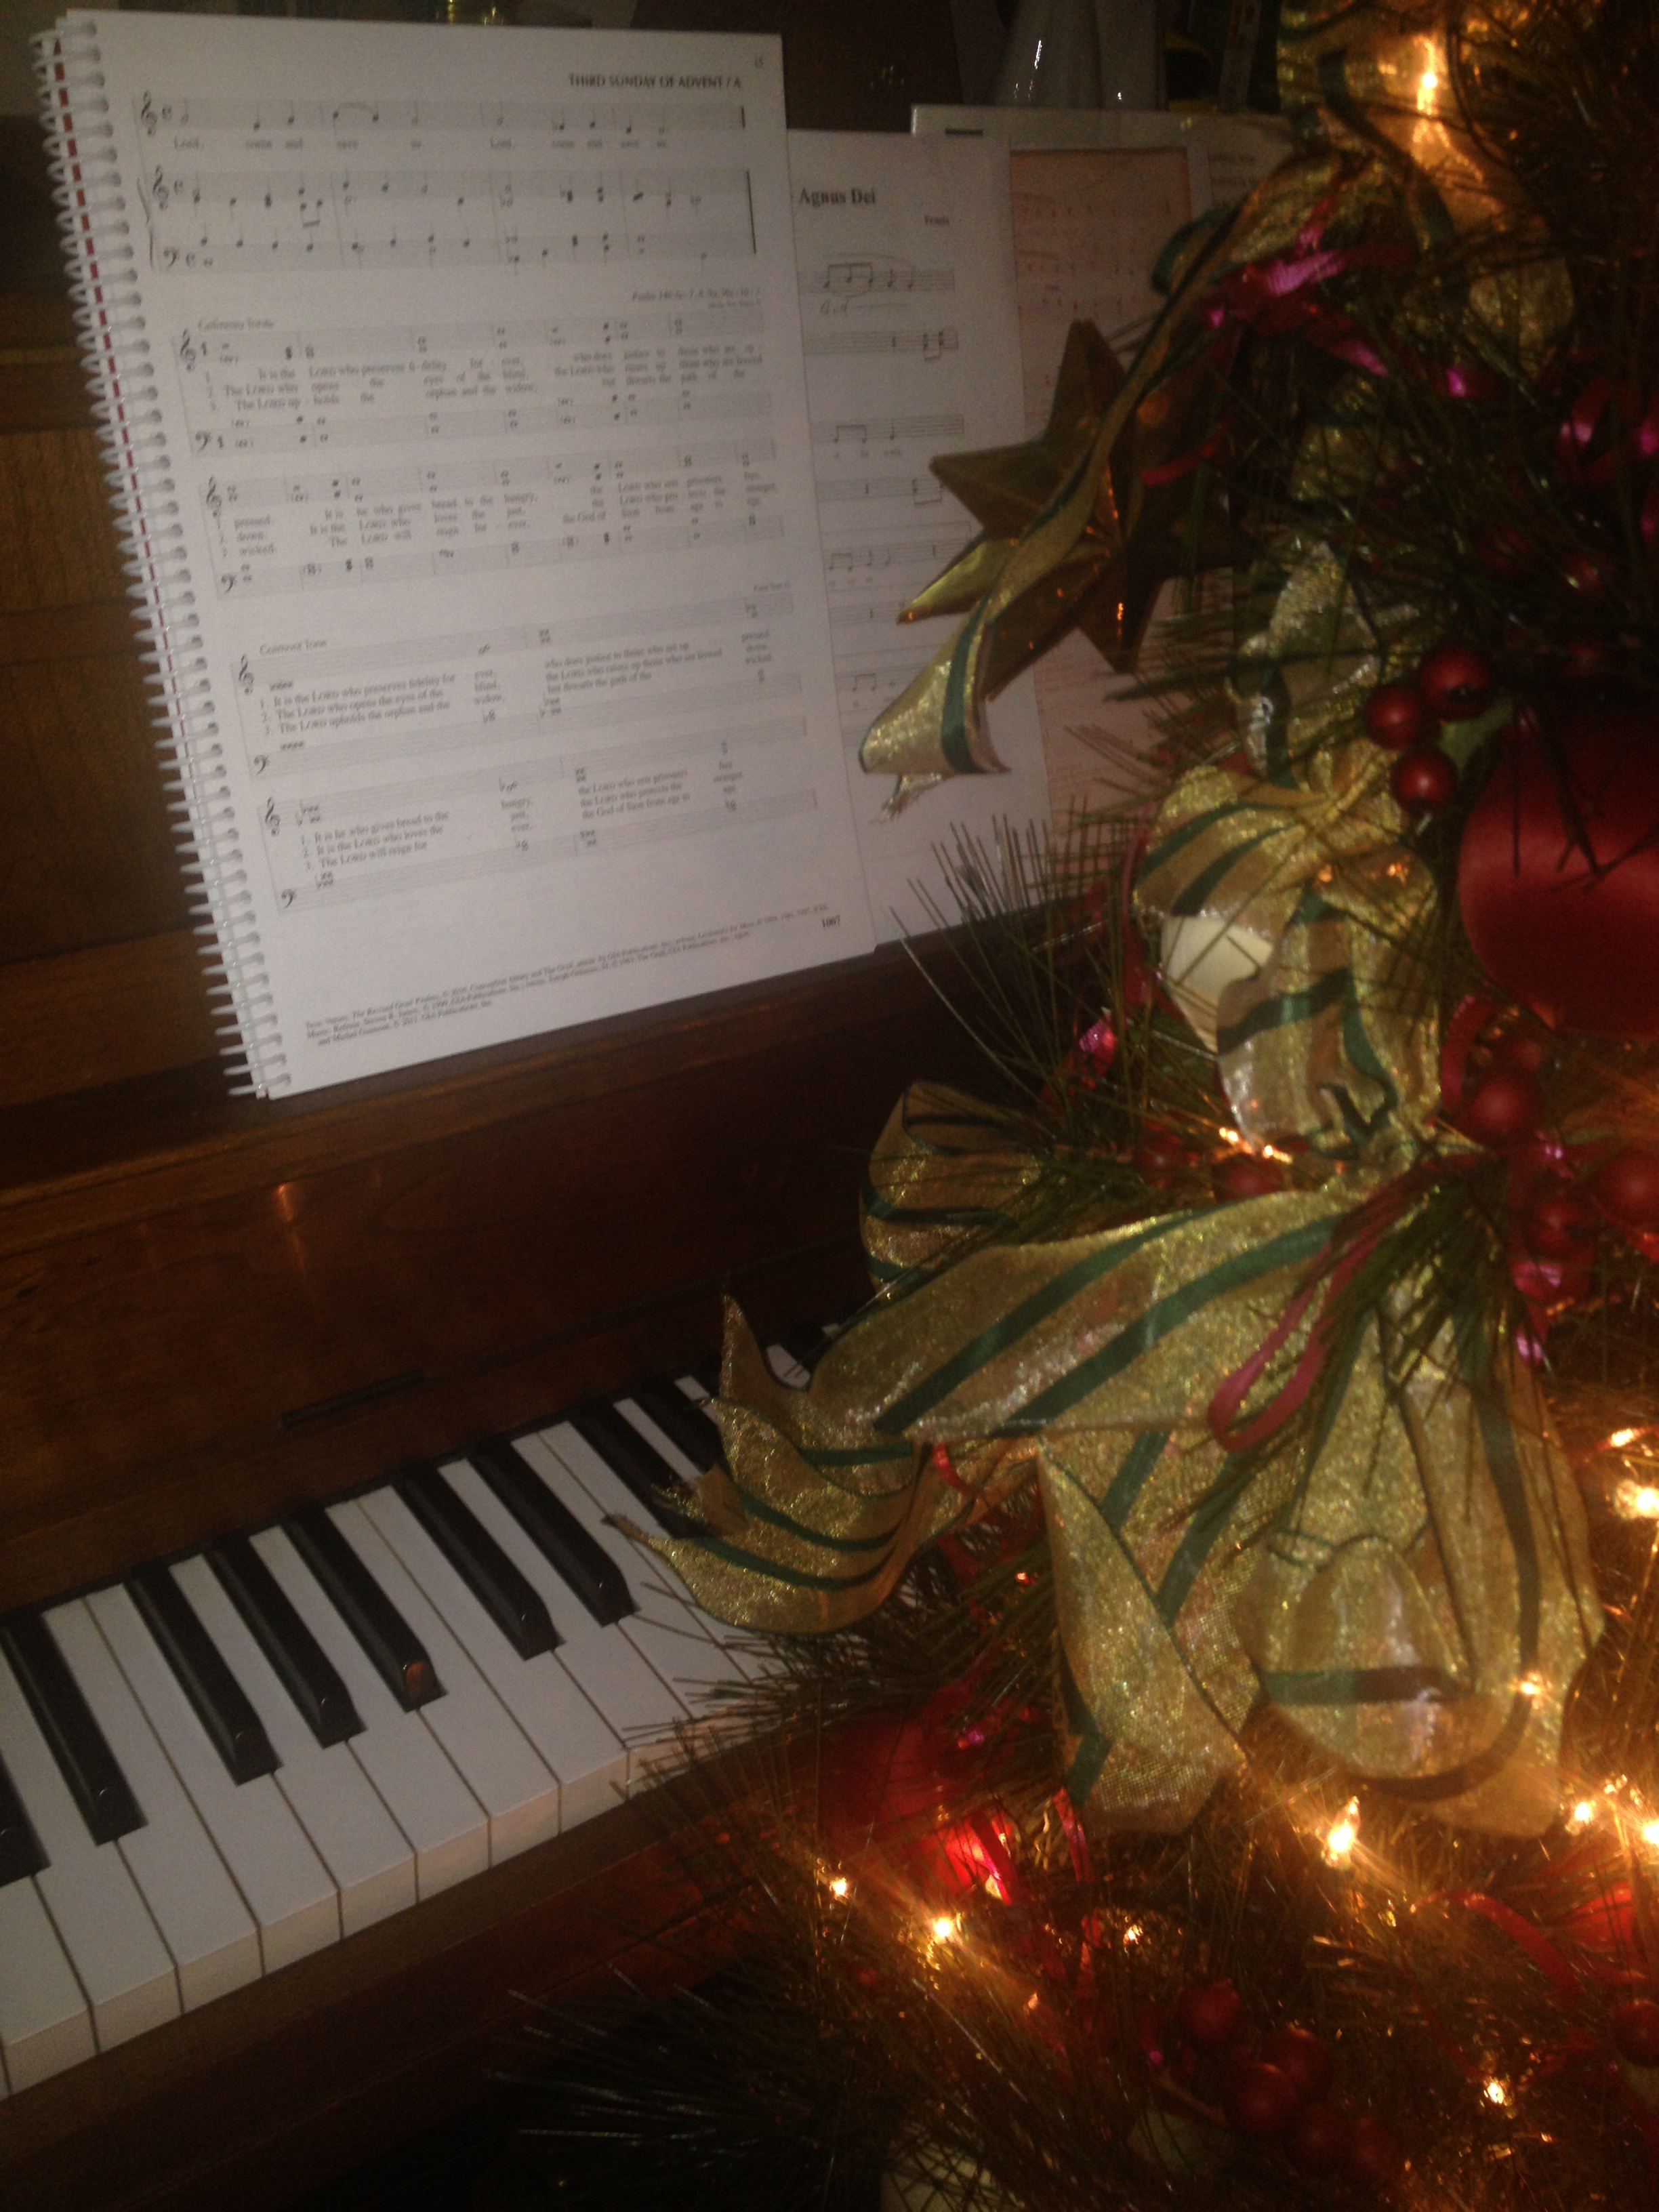 HamletHub Survey: Your Top 3 Christmas Songs